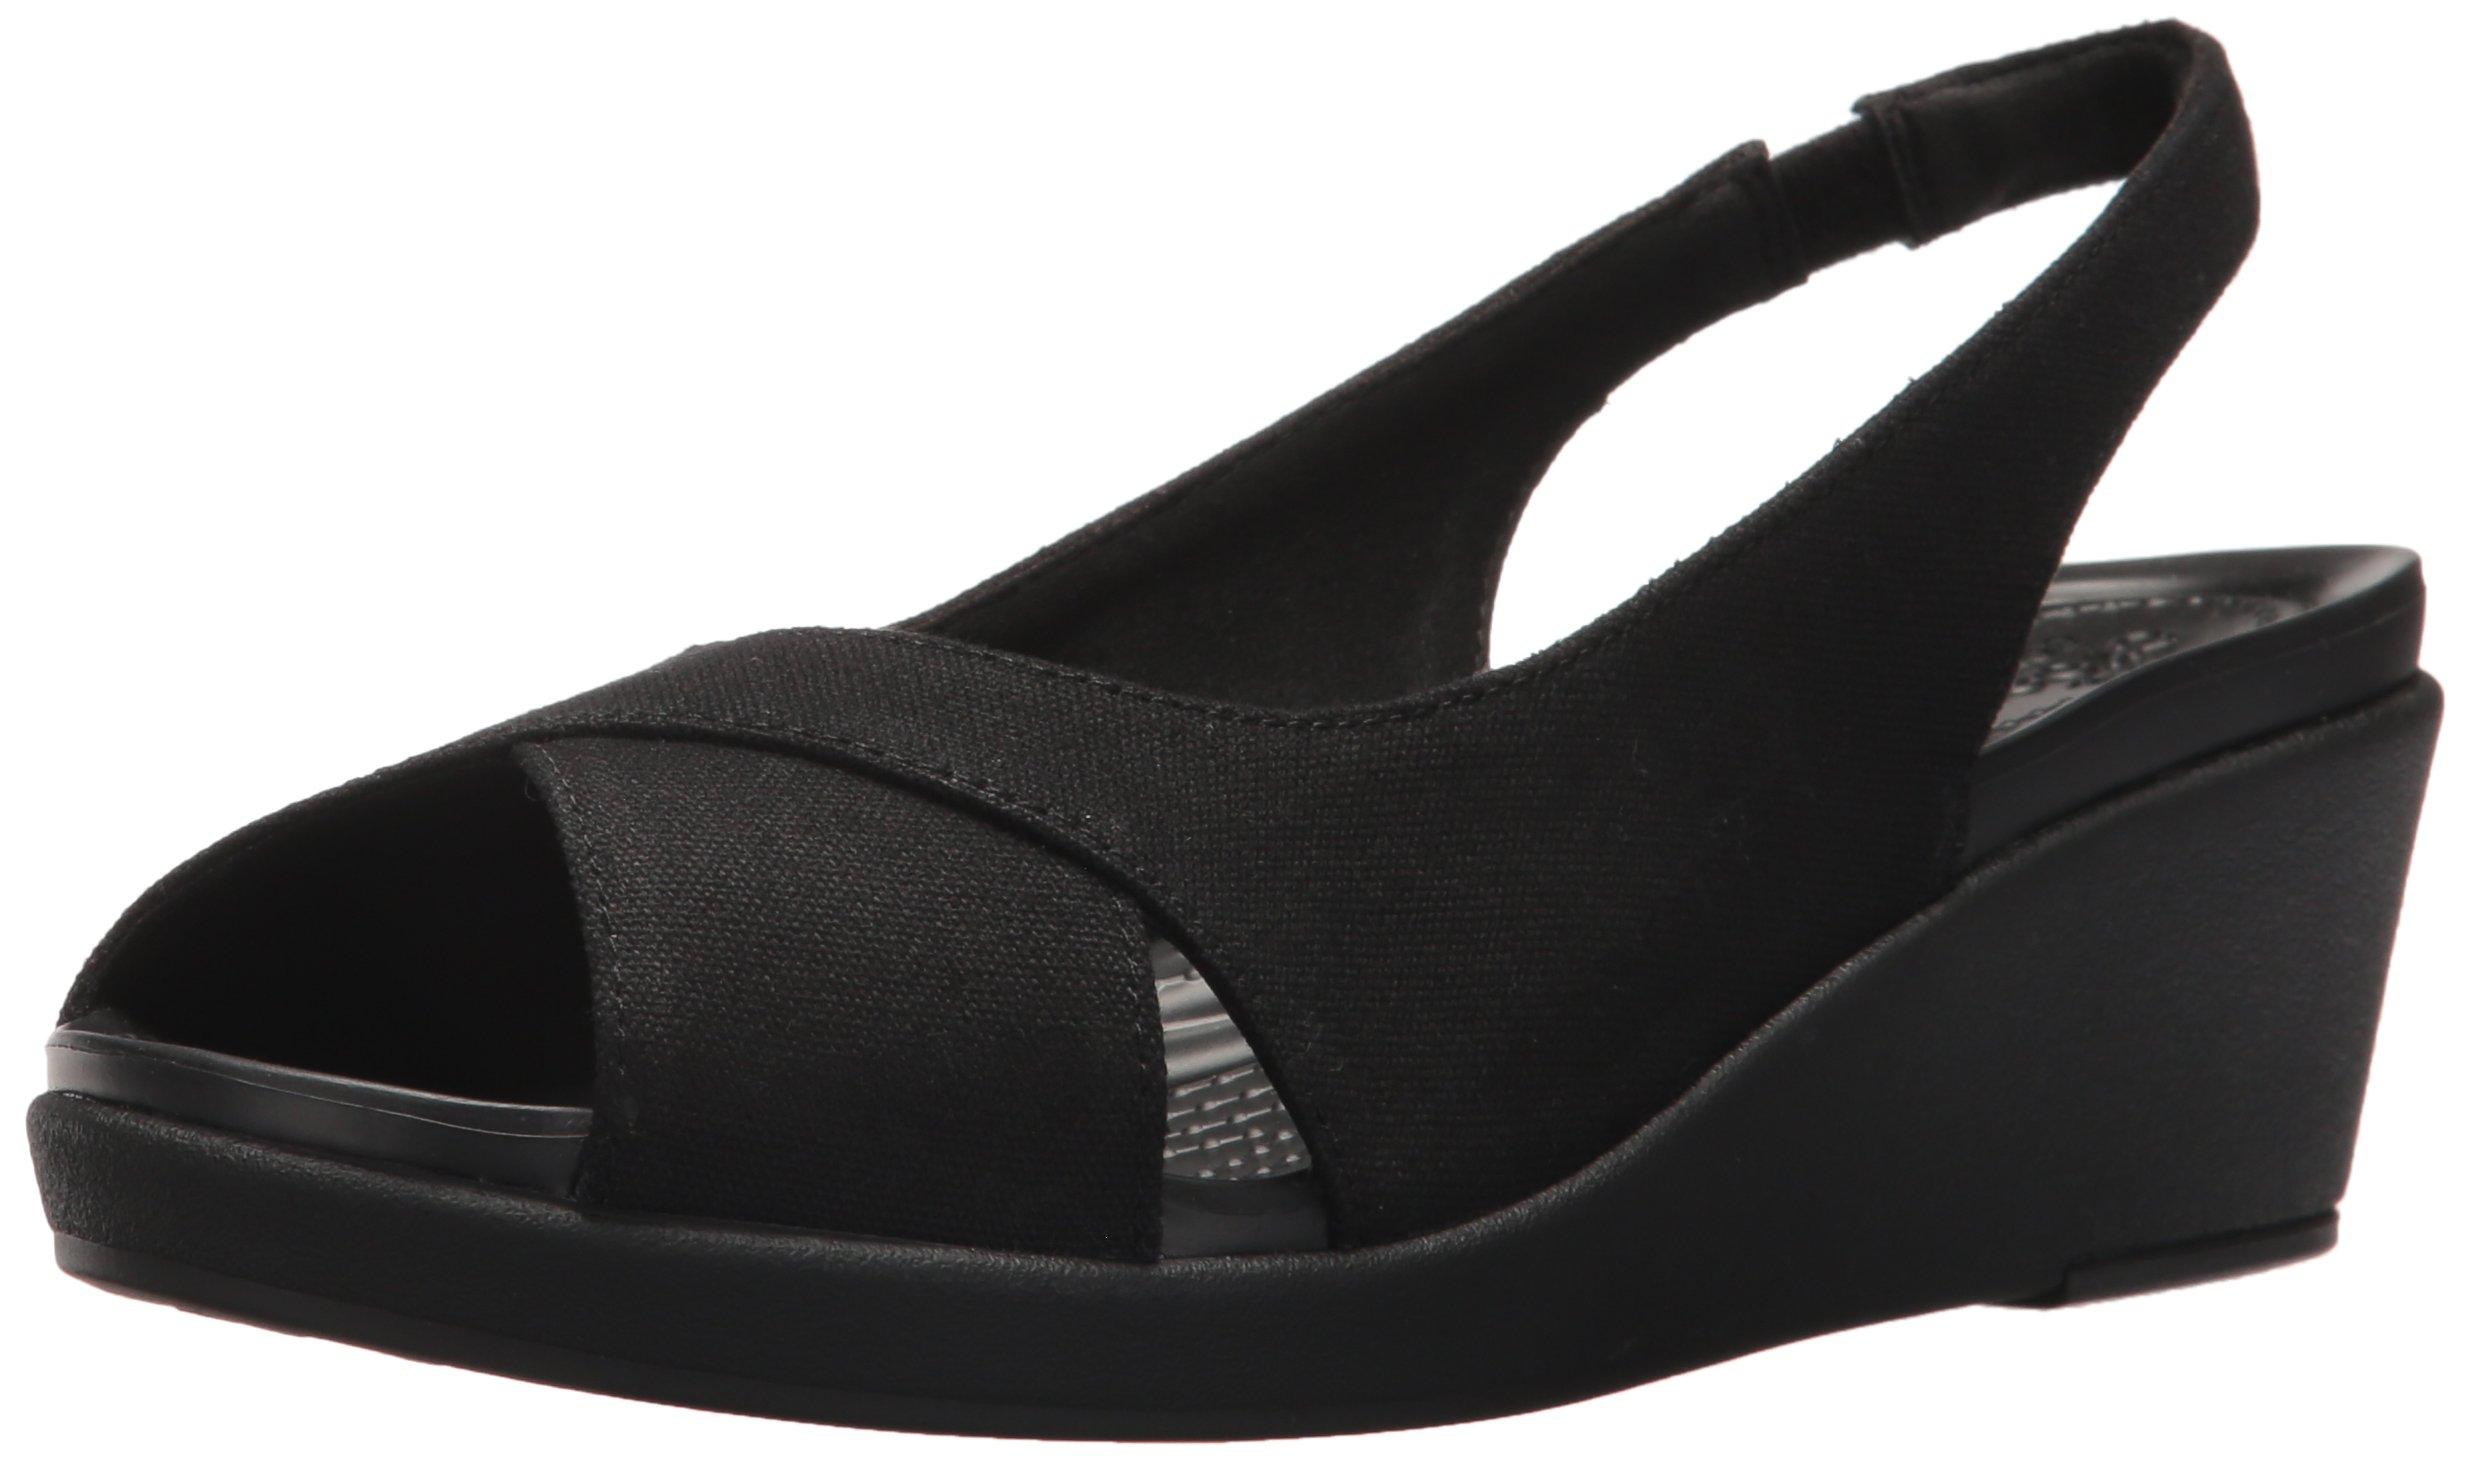 Crocs Women's Leigh Ann Slingback Wedge Sandal, Black/Black, 8 M US